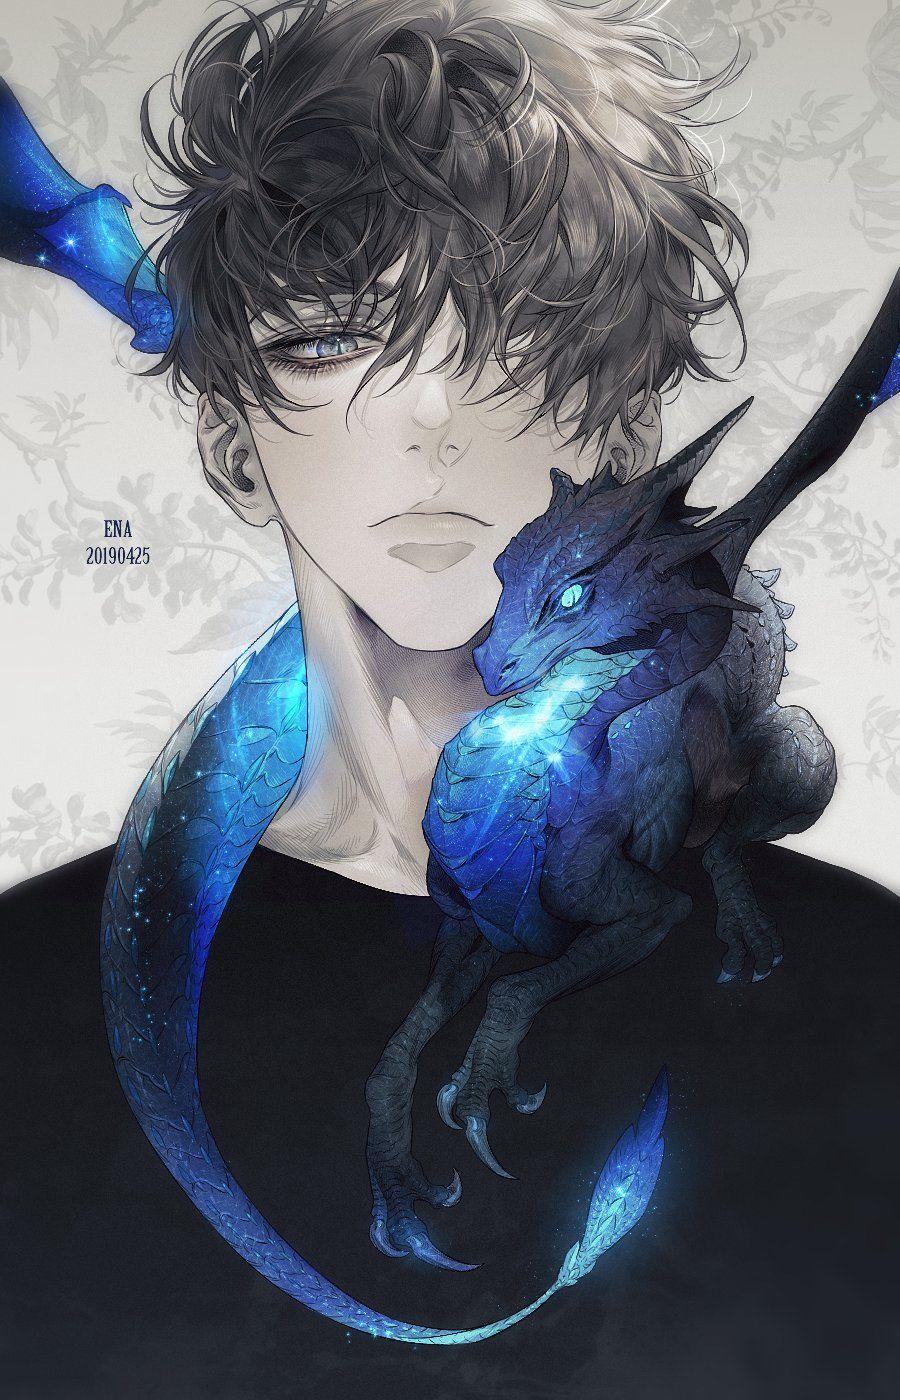 Anime Dragon Boy : anime, dragon, 에나, Twitter, Anime, Drawings, Drawings,, Fantasy